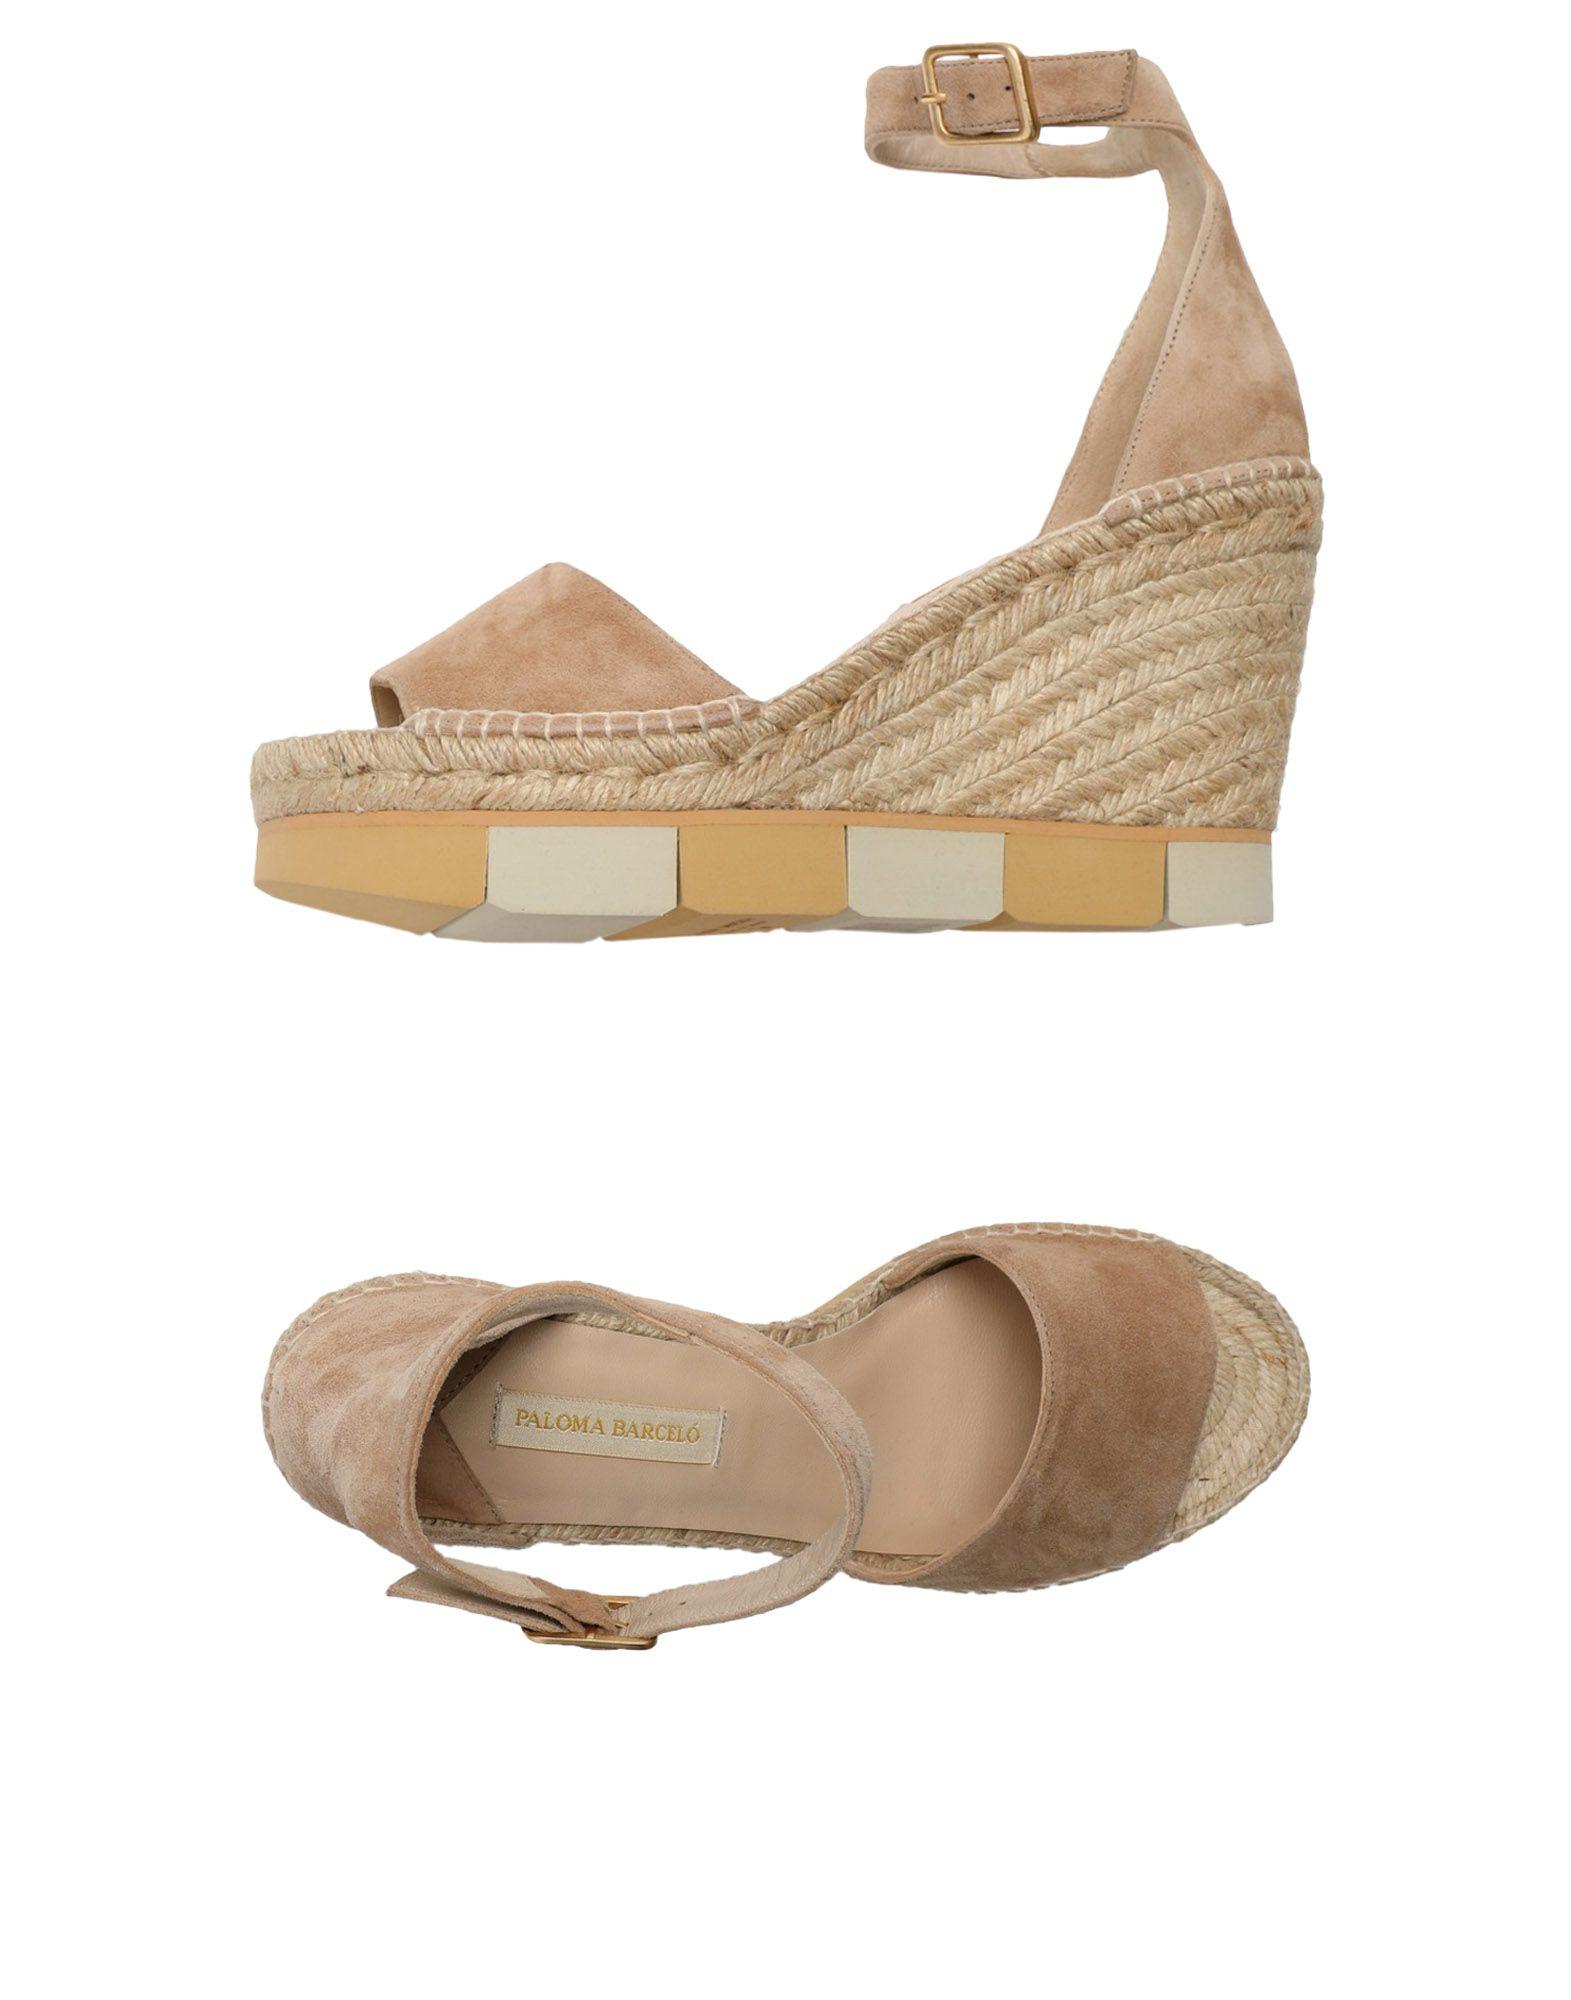 Paloma Barceló Espadrilles Damen  11366951WM Gute Qualität beliebte Schuhe